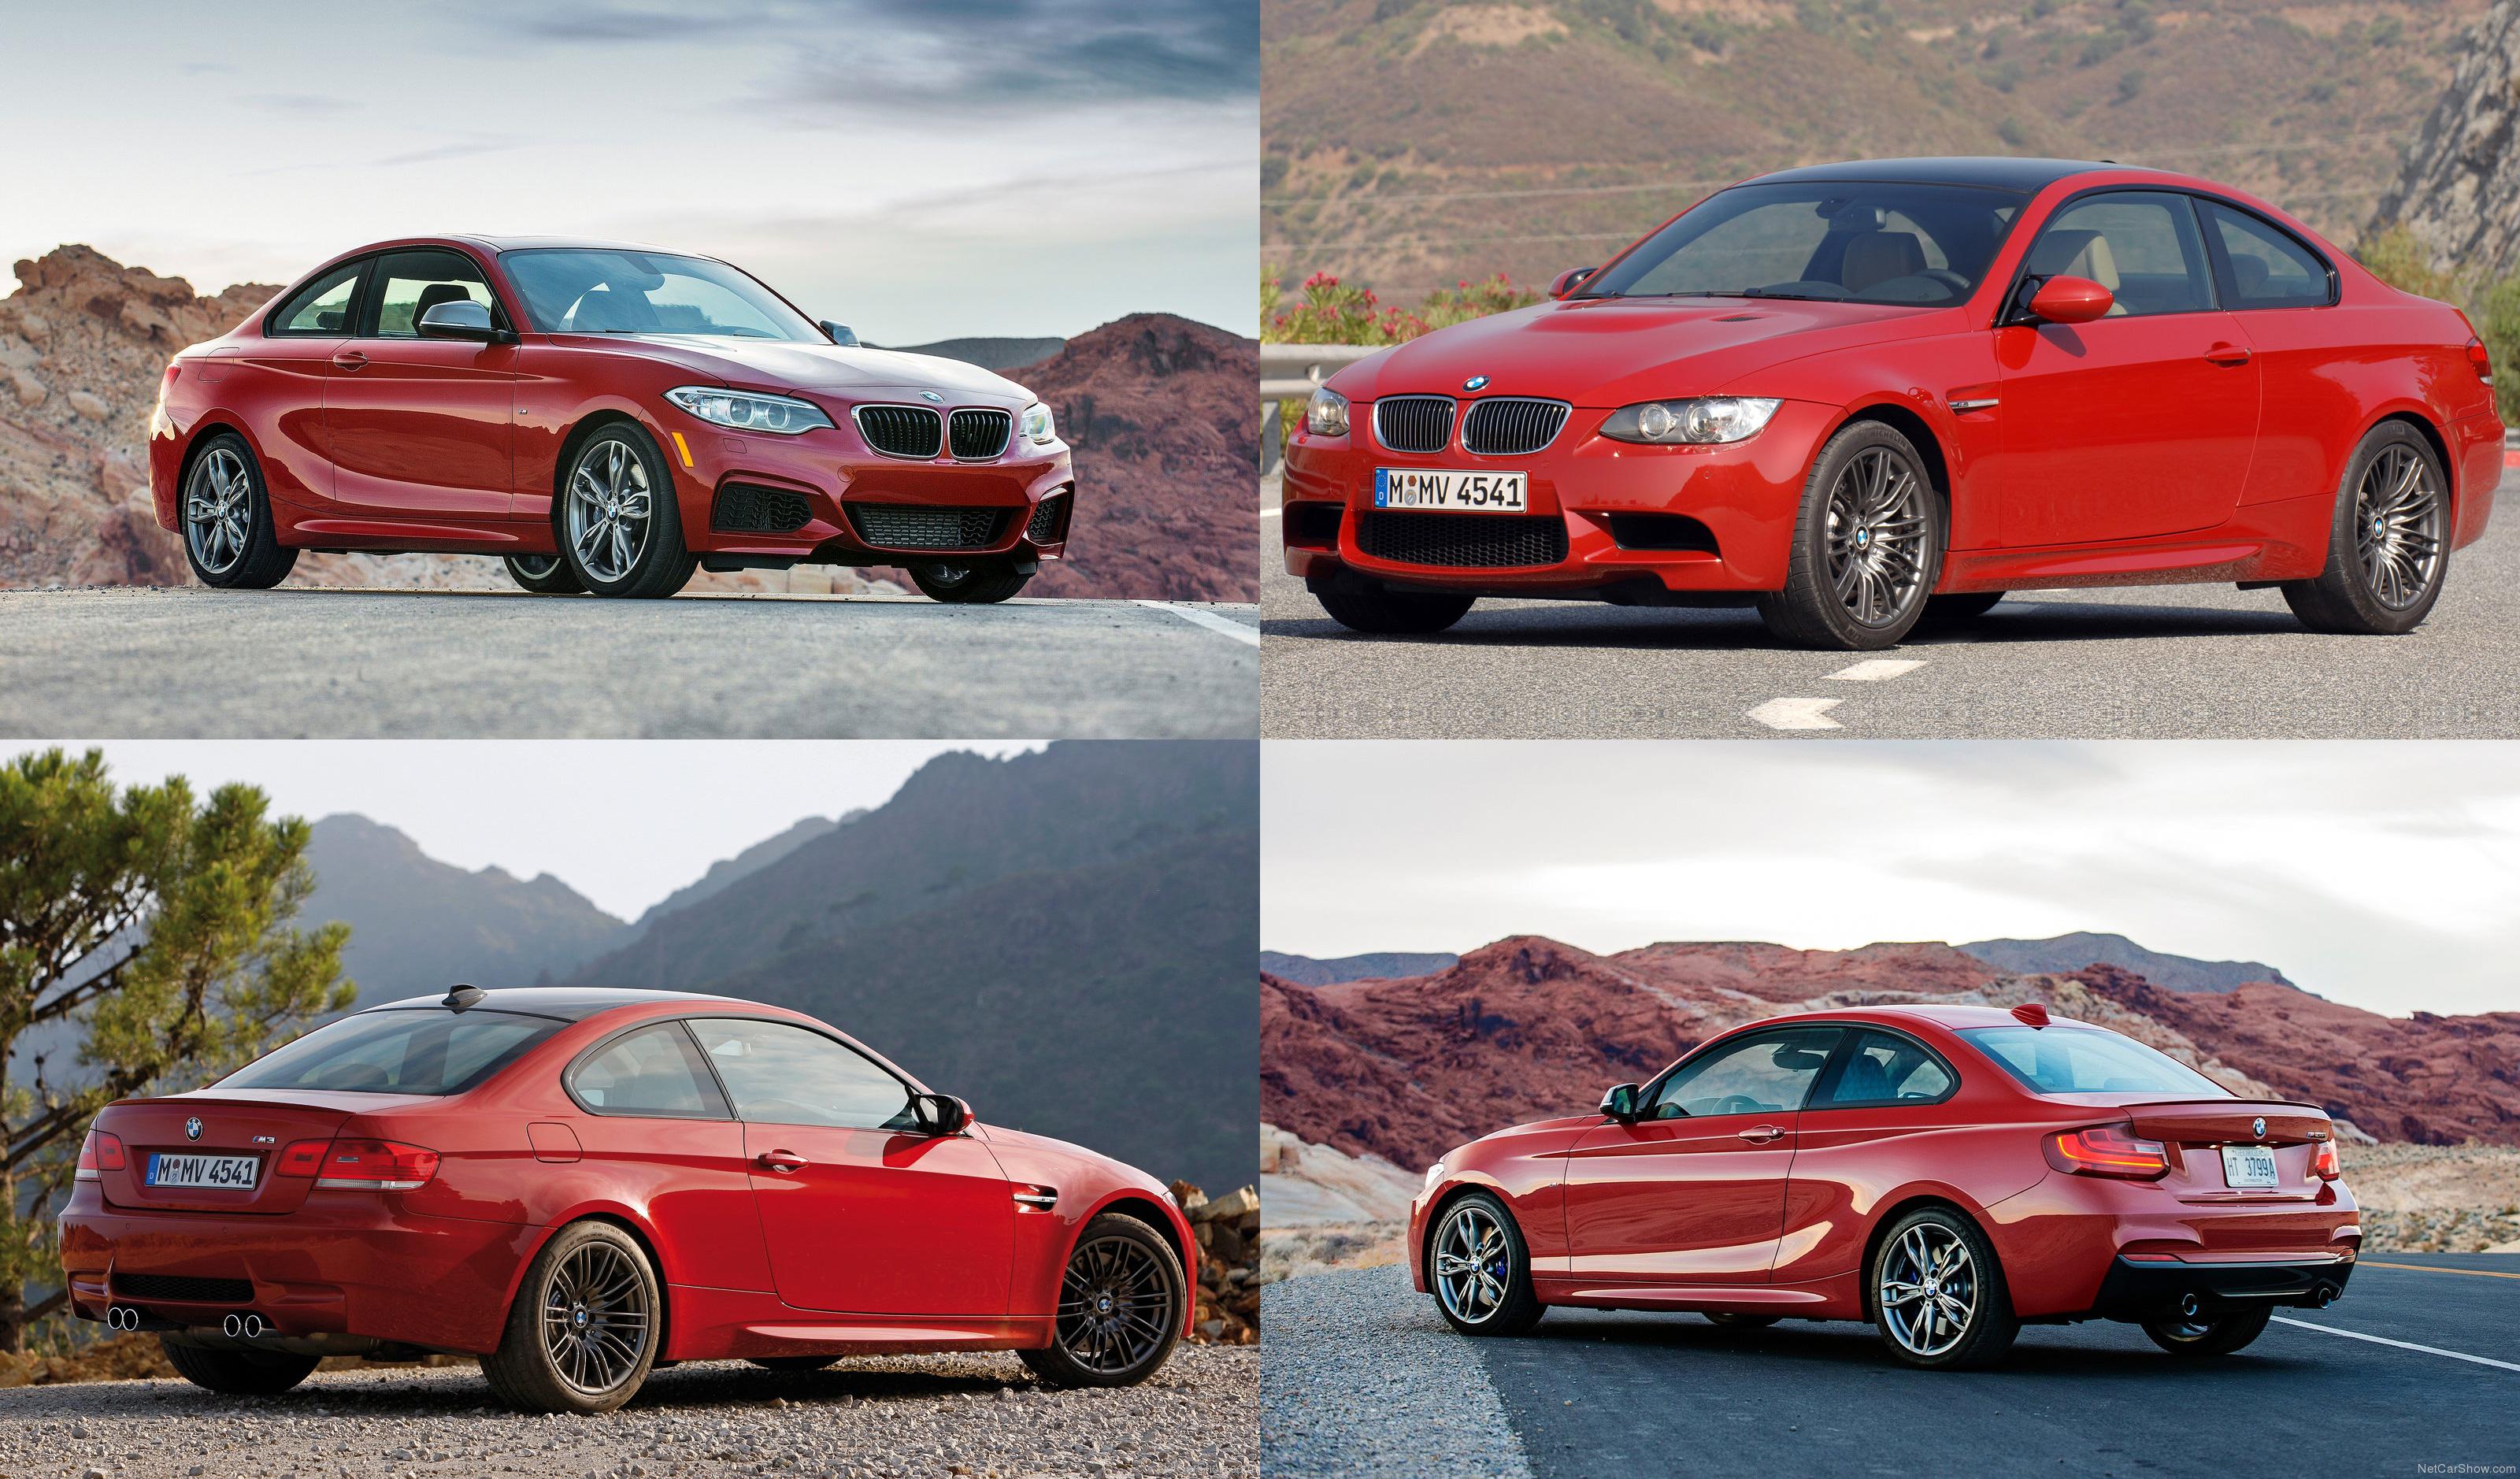 BMW m3 vs m235i